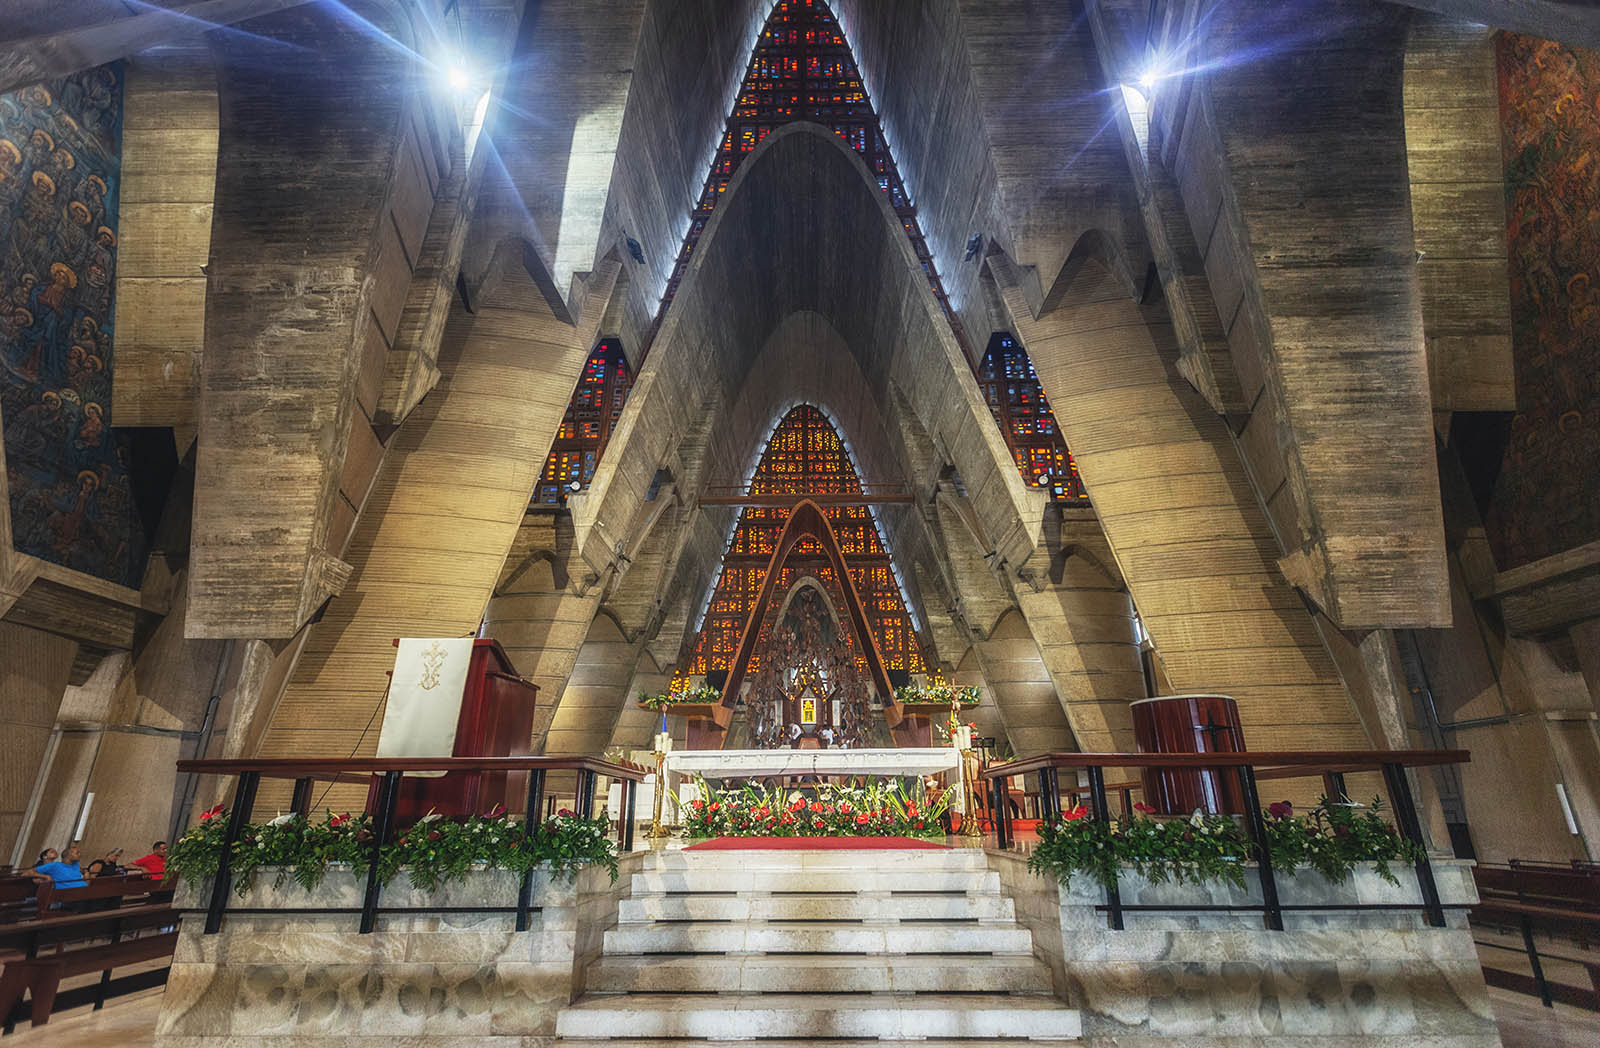 Higüey Basilica